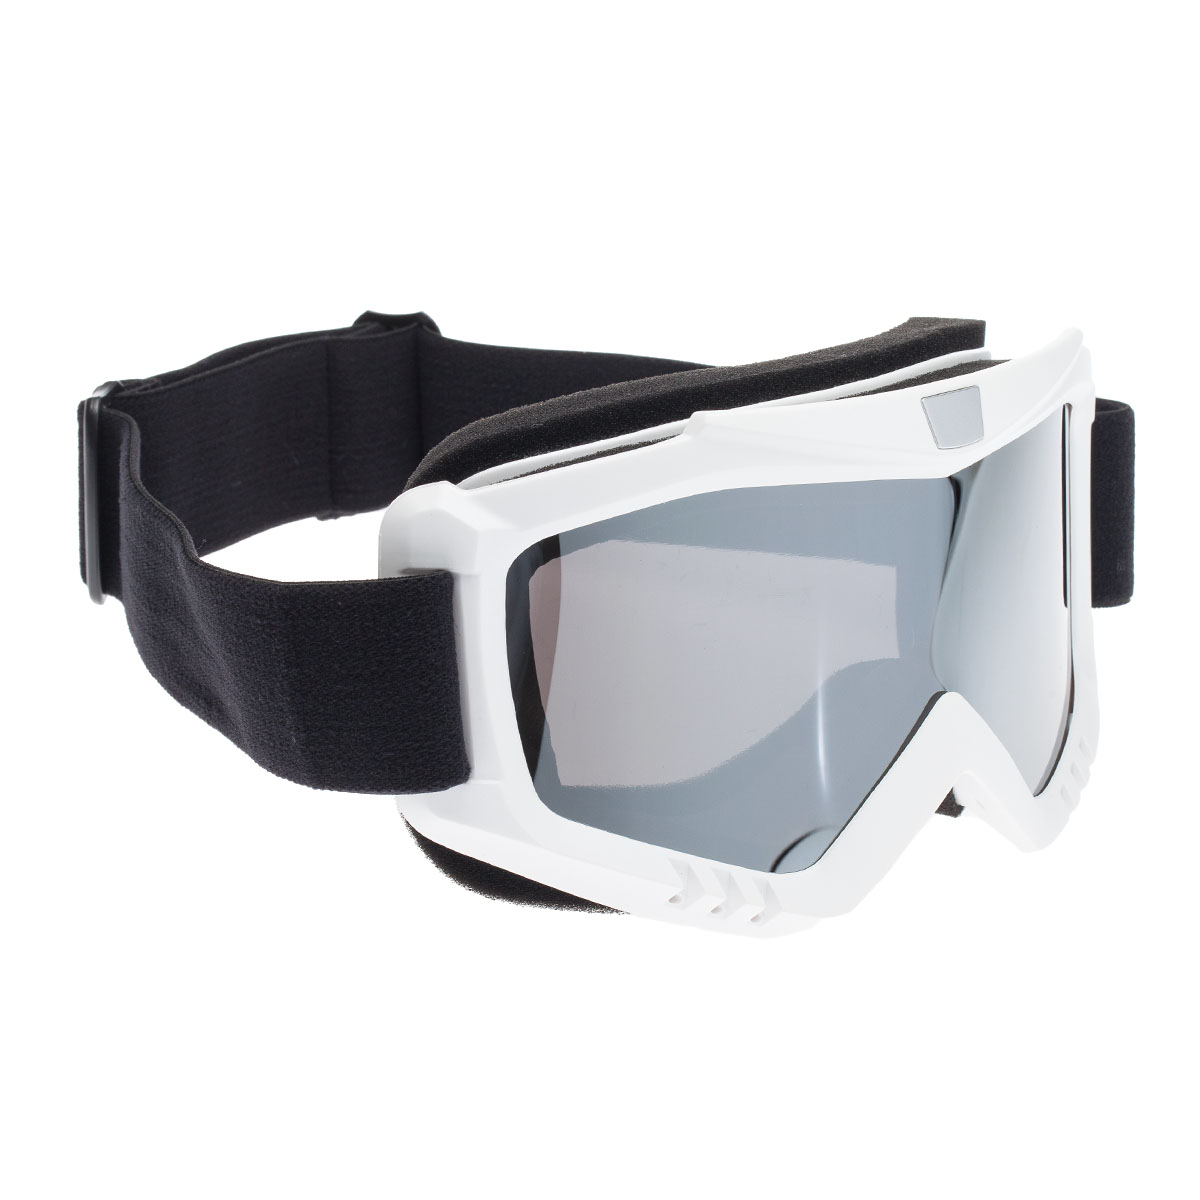 очки горнолыжные vcan ag0172 vse64 Горнолыжные очки Exparc, 15653-4